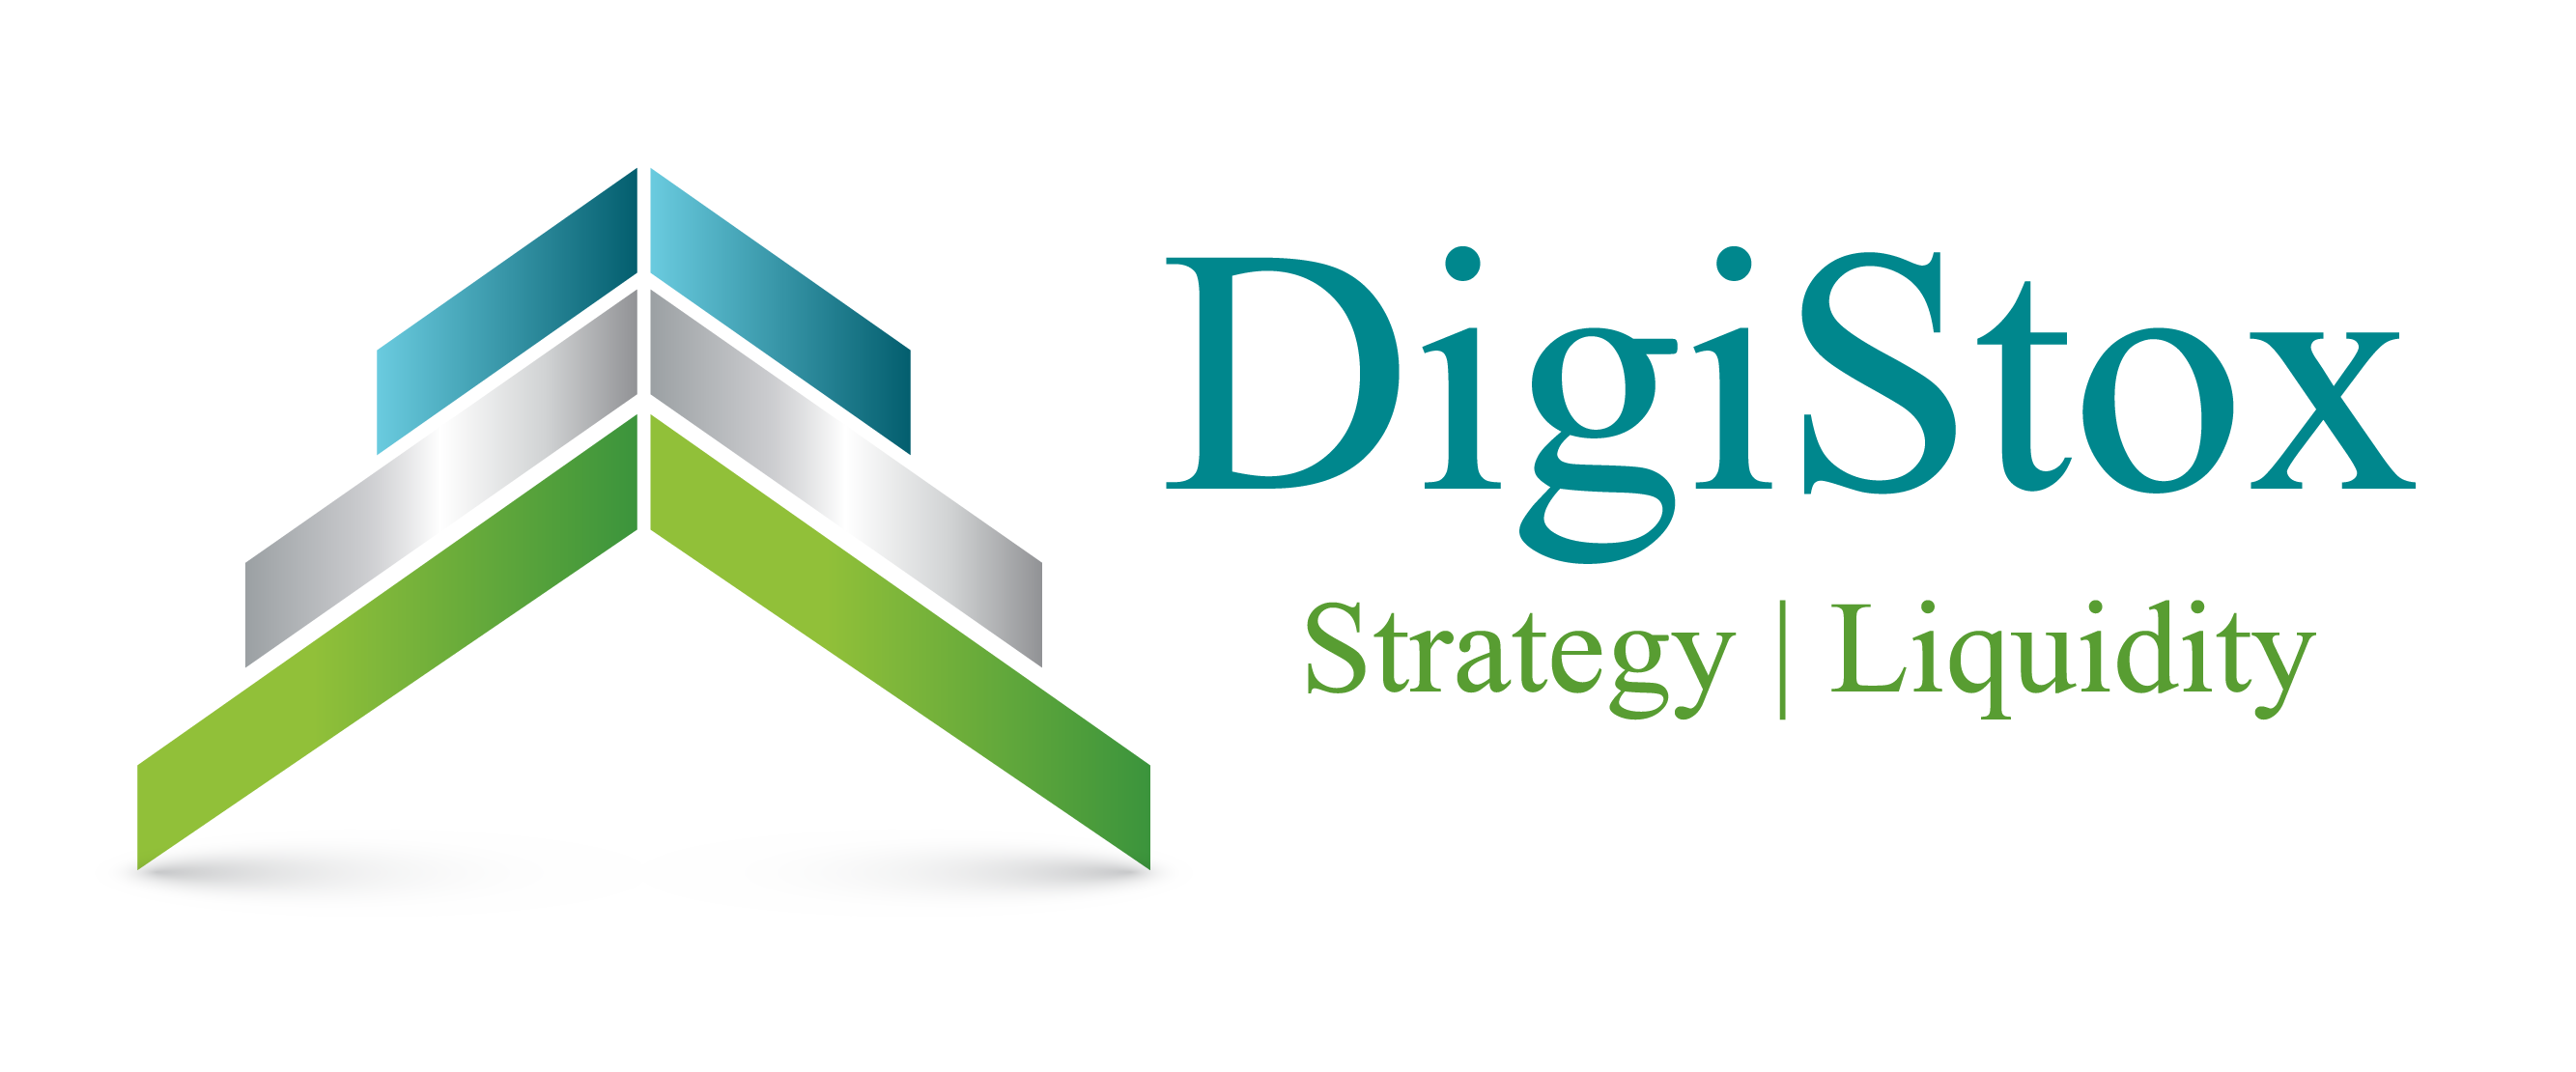 DigiStox Logo